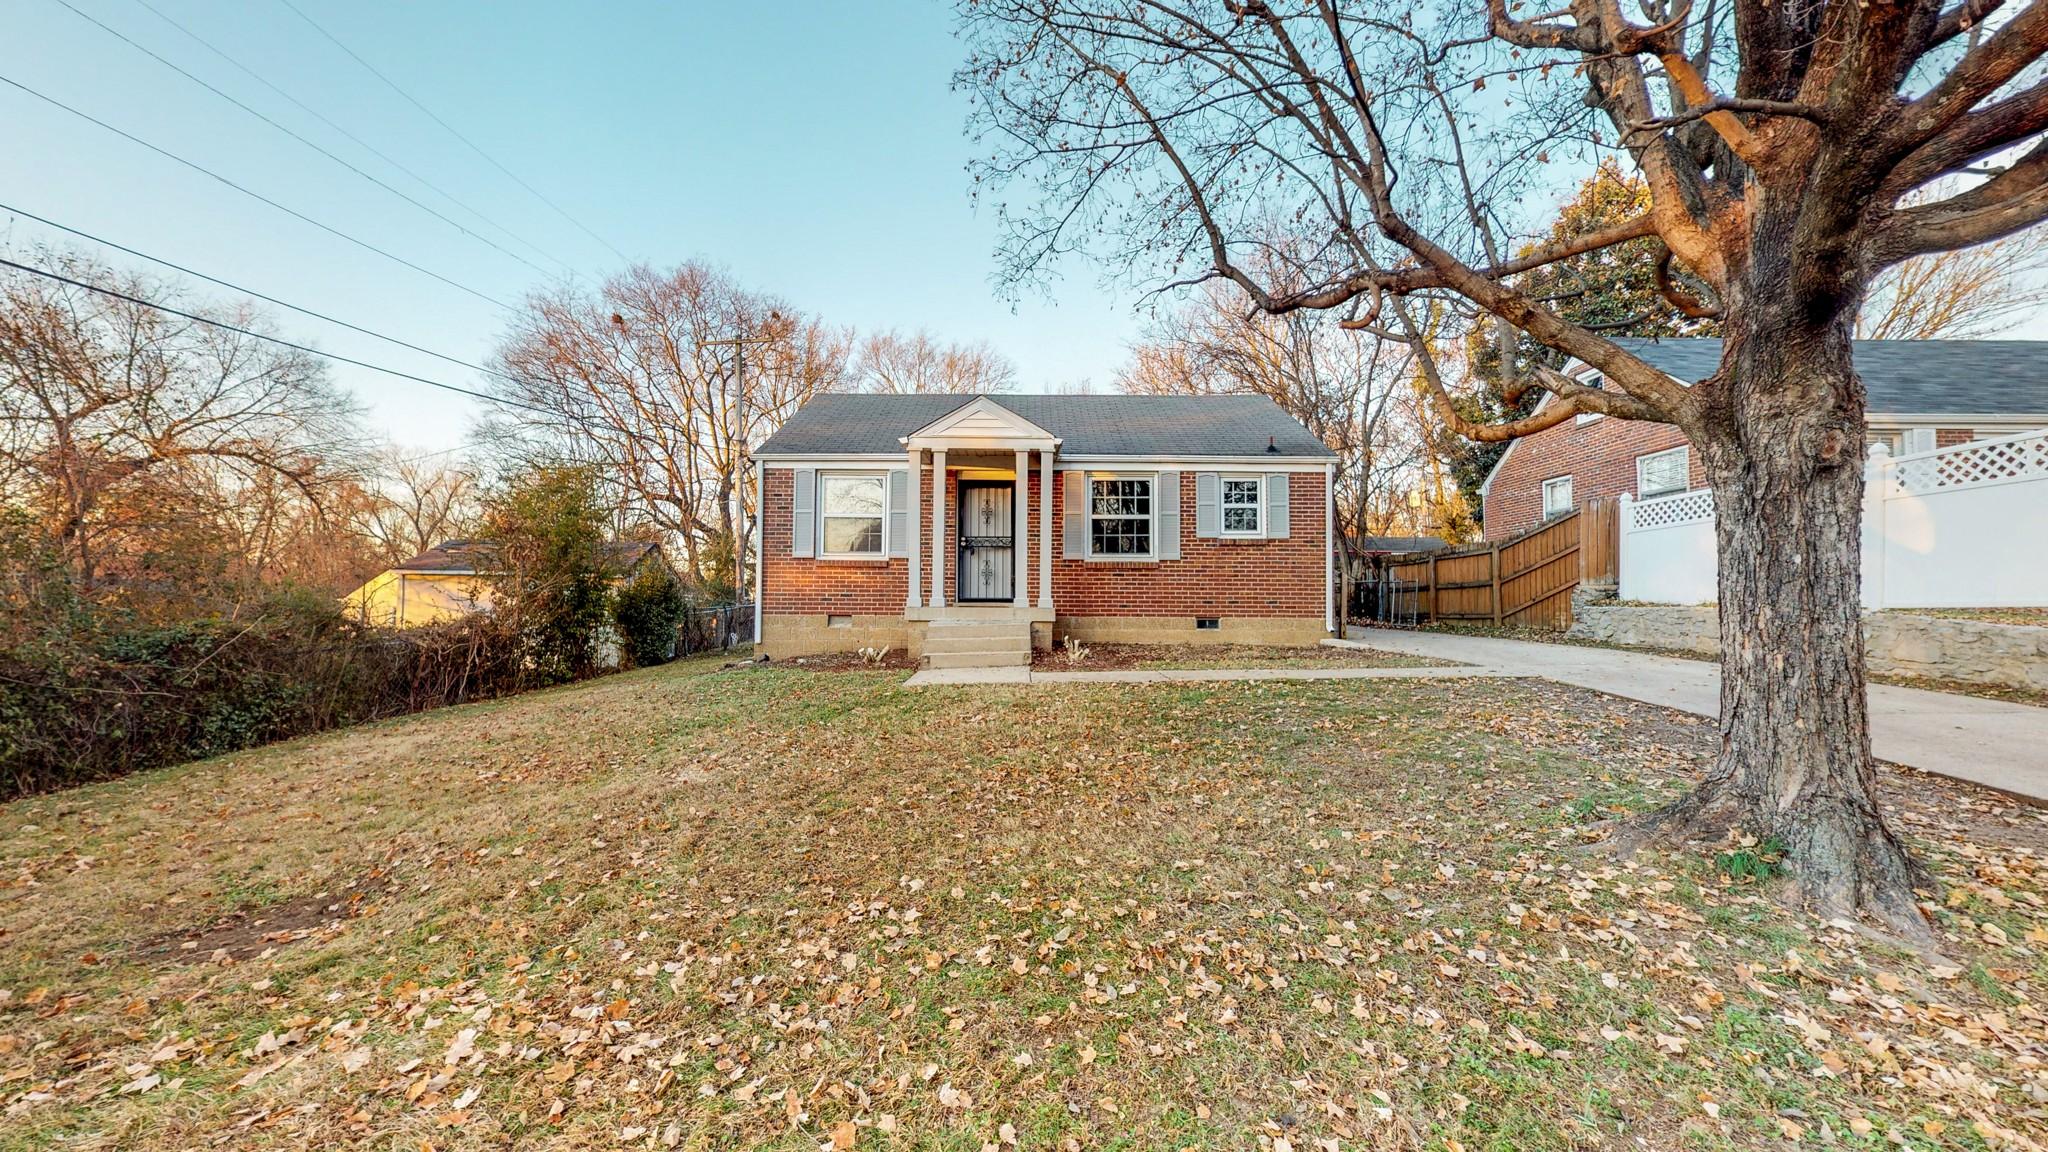 1304 Mercury Dr, Nashville, TN 37217 - Nashville, TN real estate listing